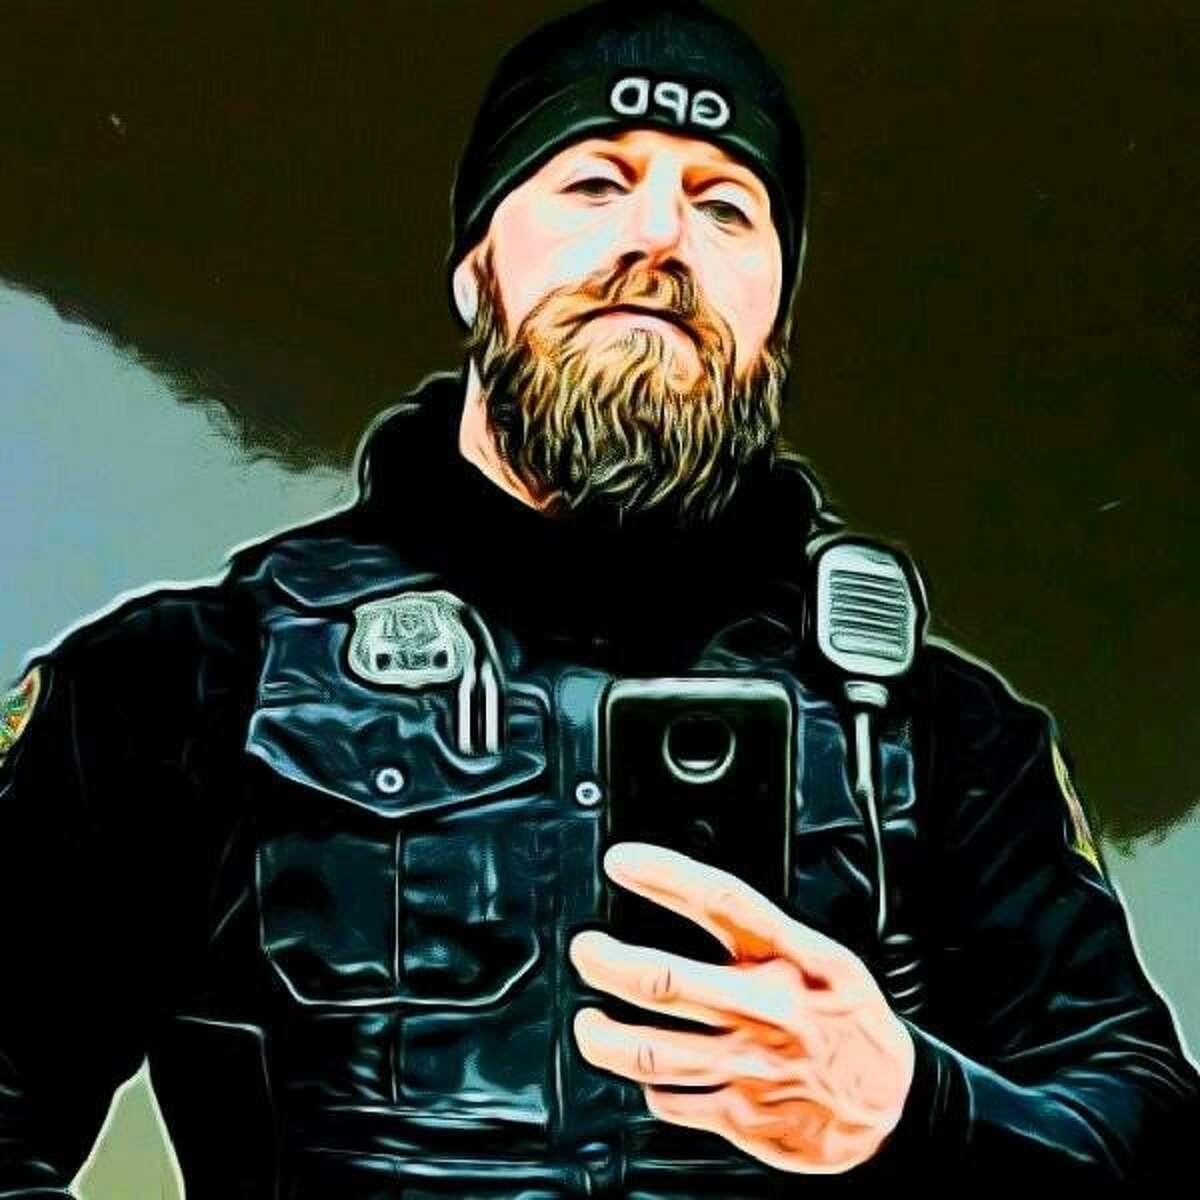 A social-media portrait of Officer Quagliani